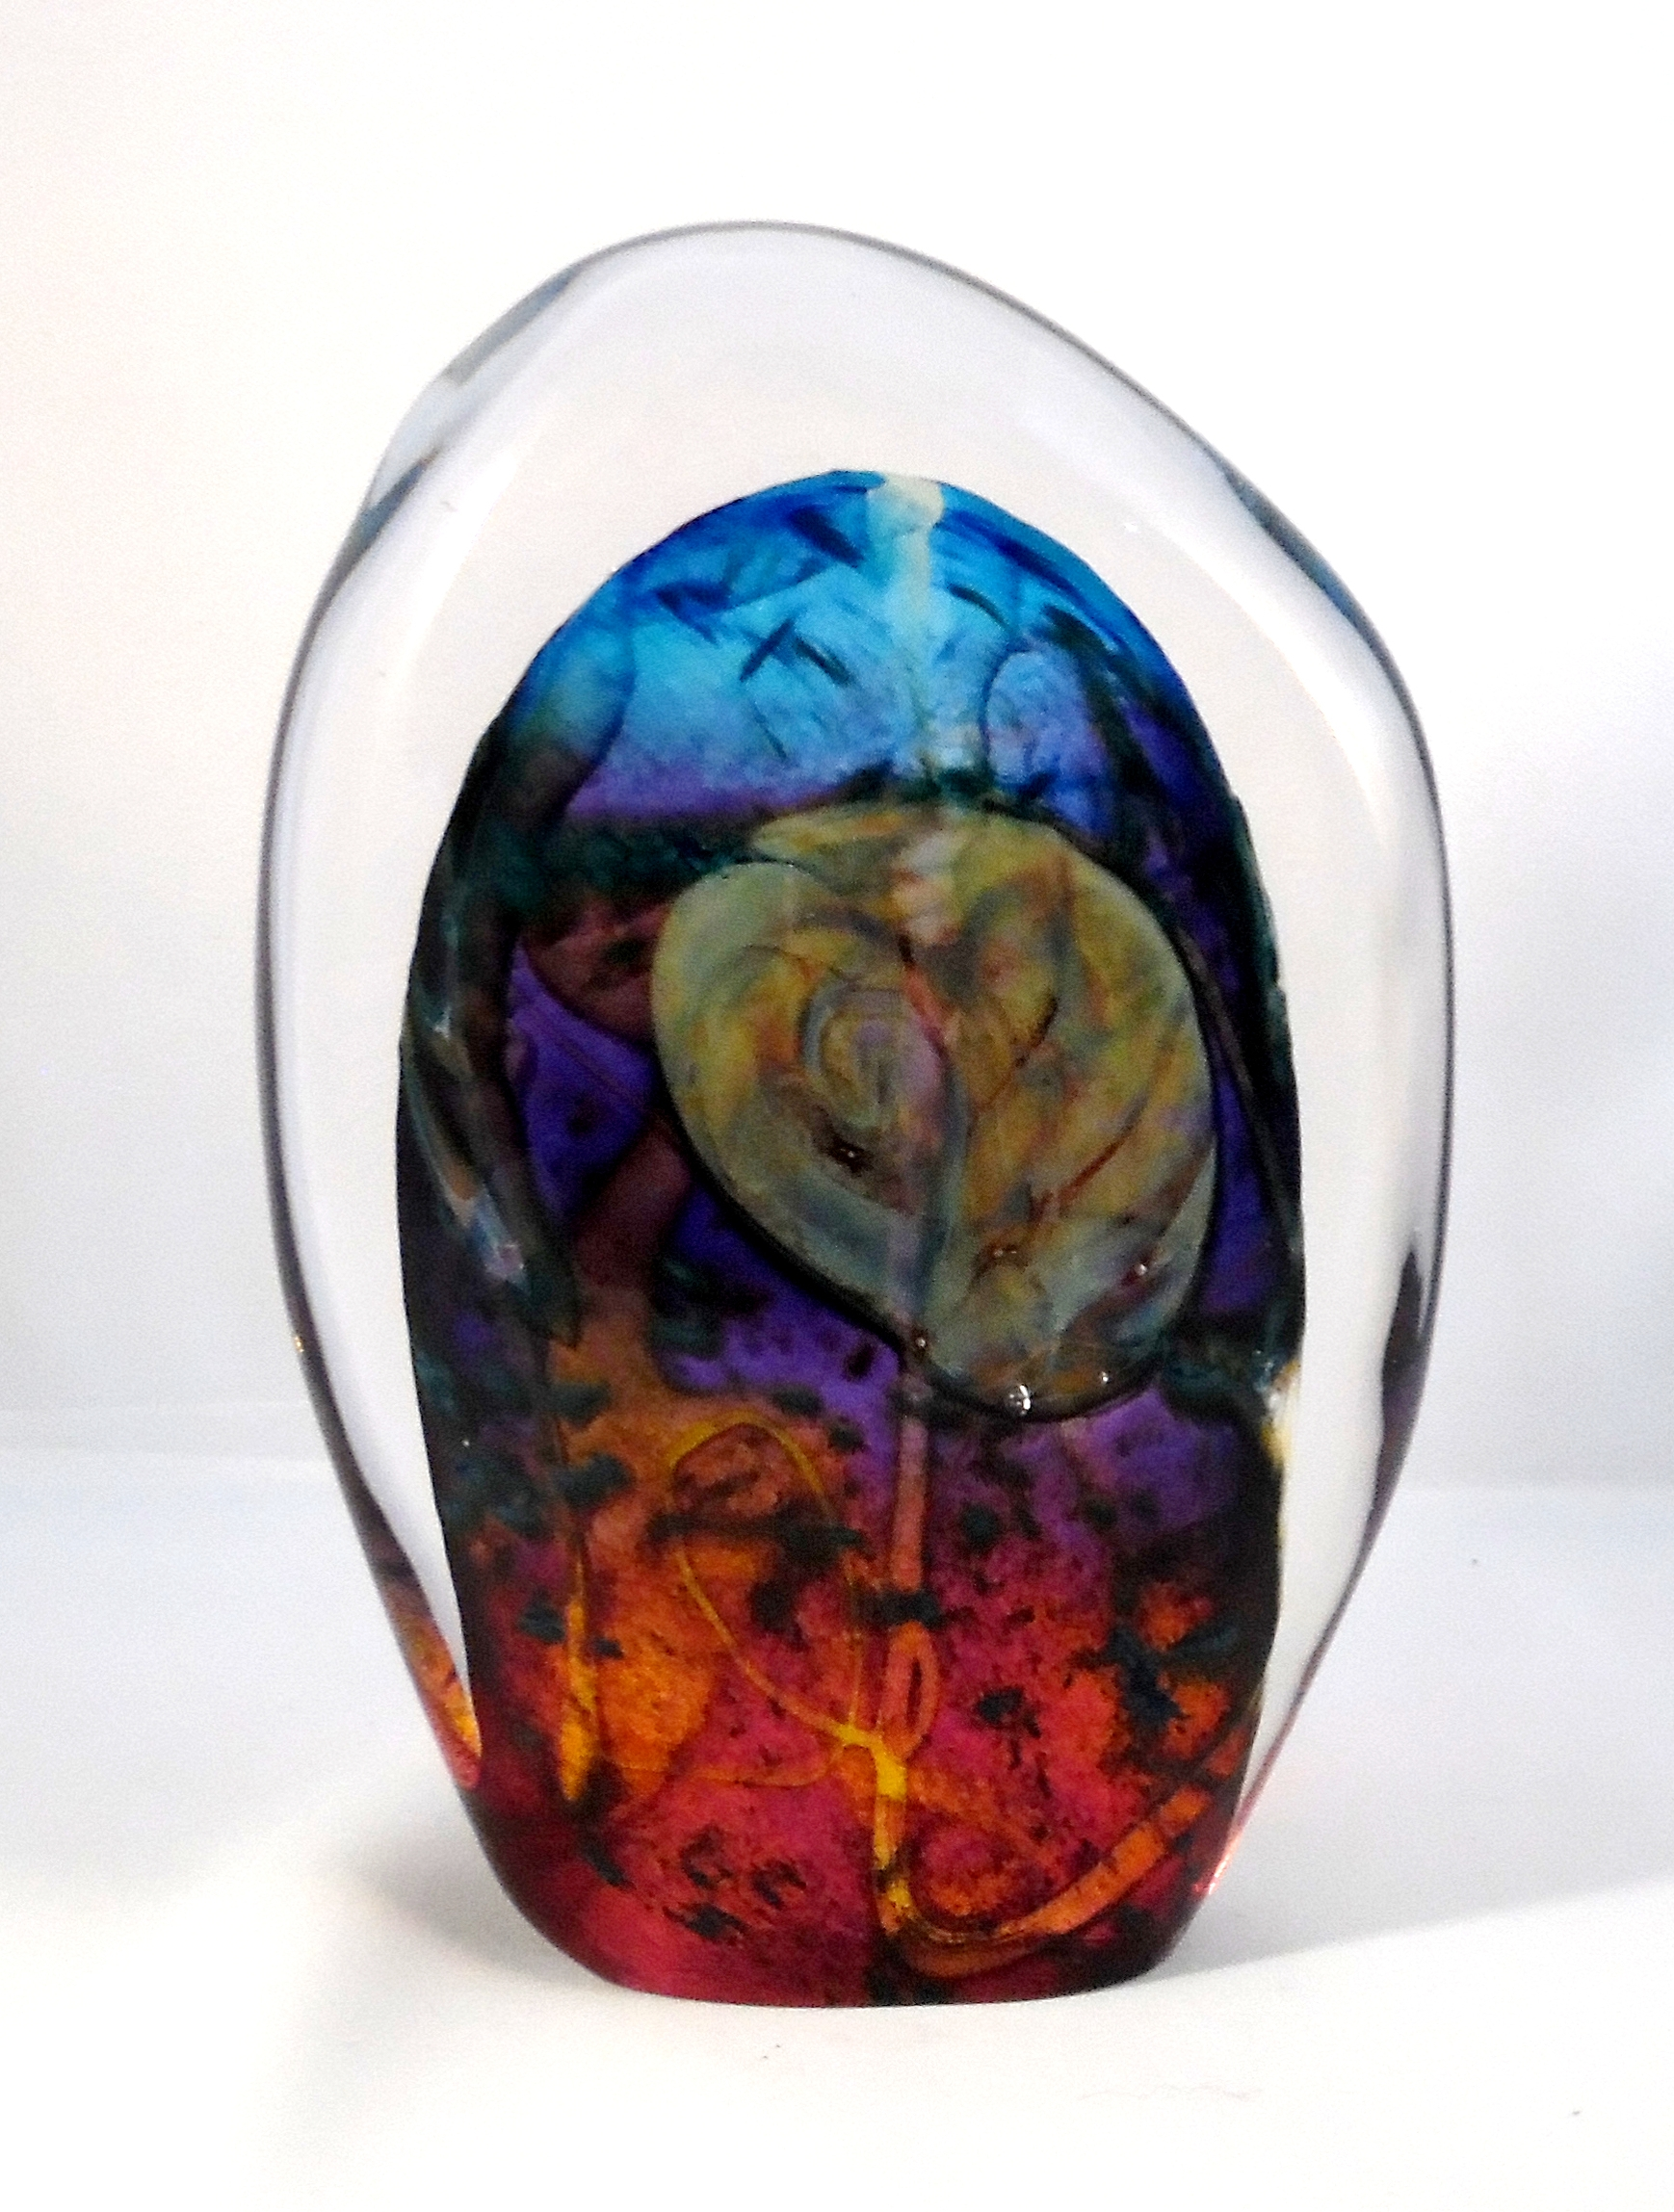 Amonite Stone by Nicole Tremblay